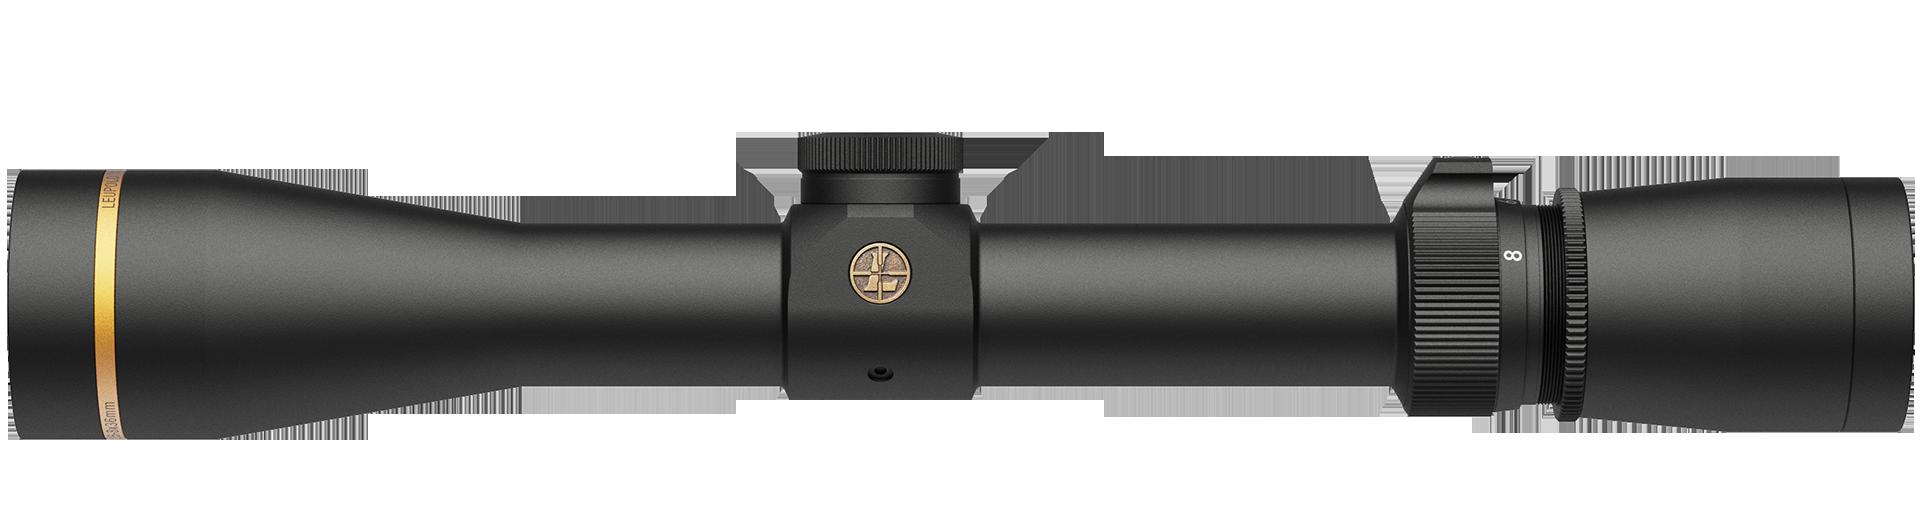 2.5-8x36mm